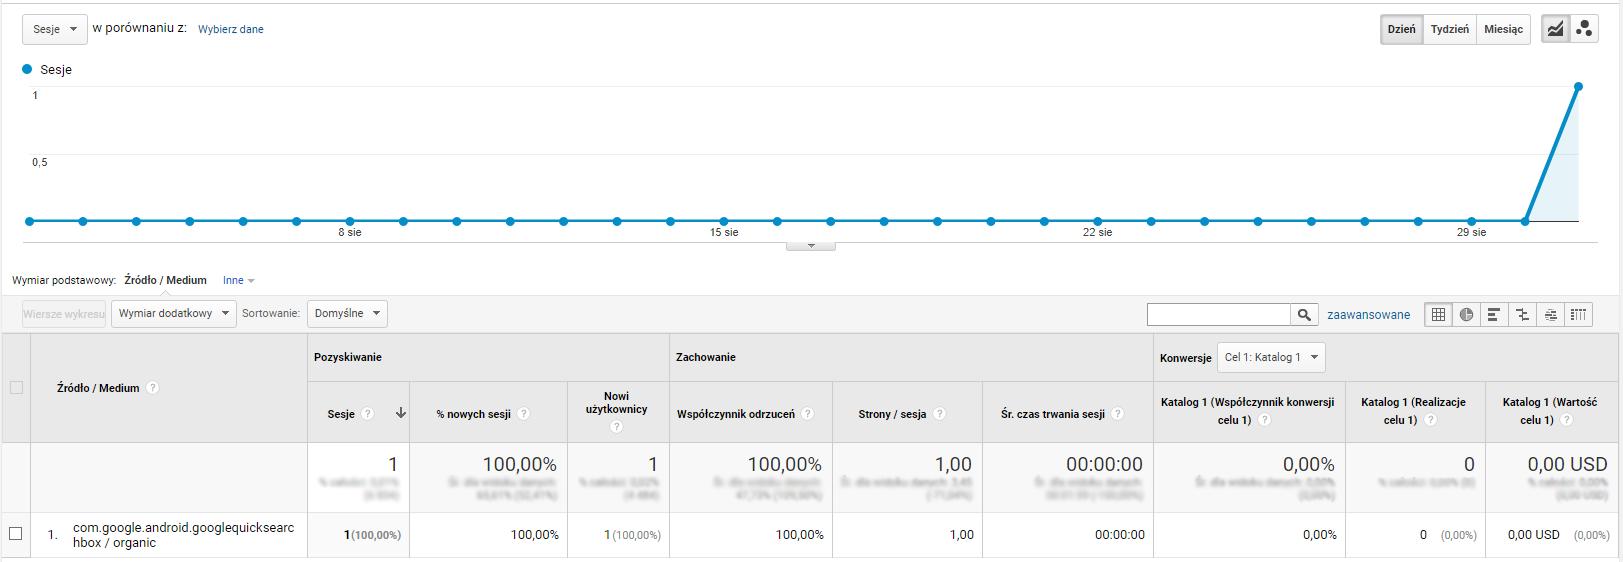 Wykres Ruchu Organicznego dla com.google.android.googlequicksearchbox